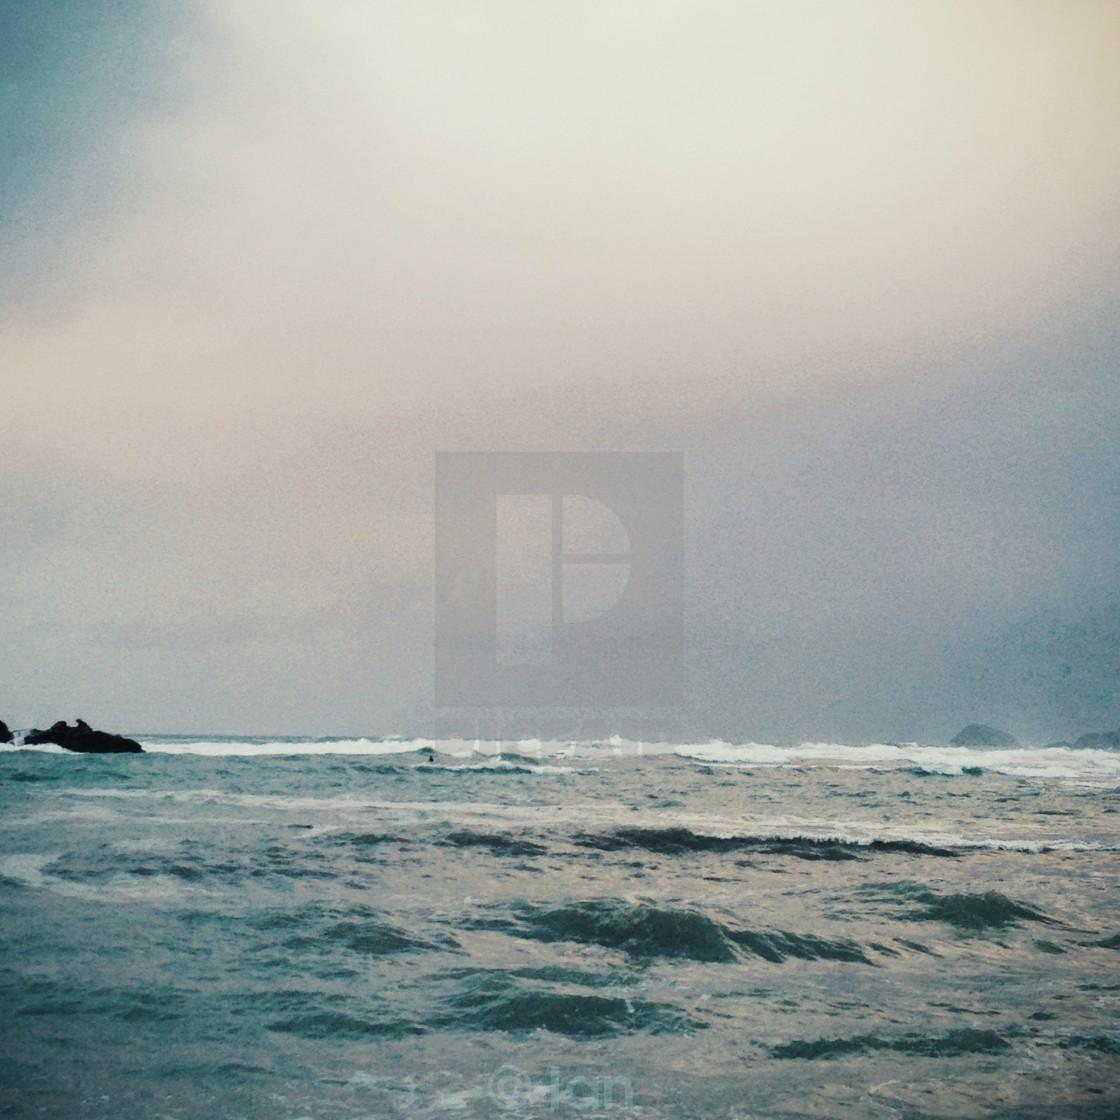 """Stormy Skys in Porthtowarn"" stock image"